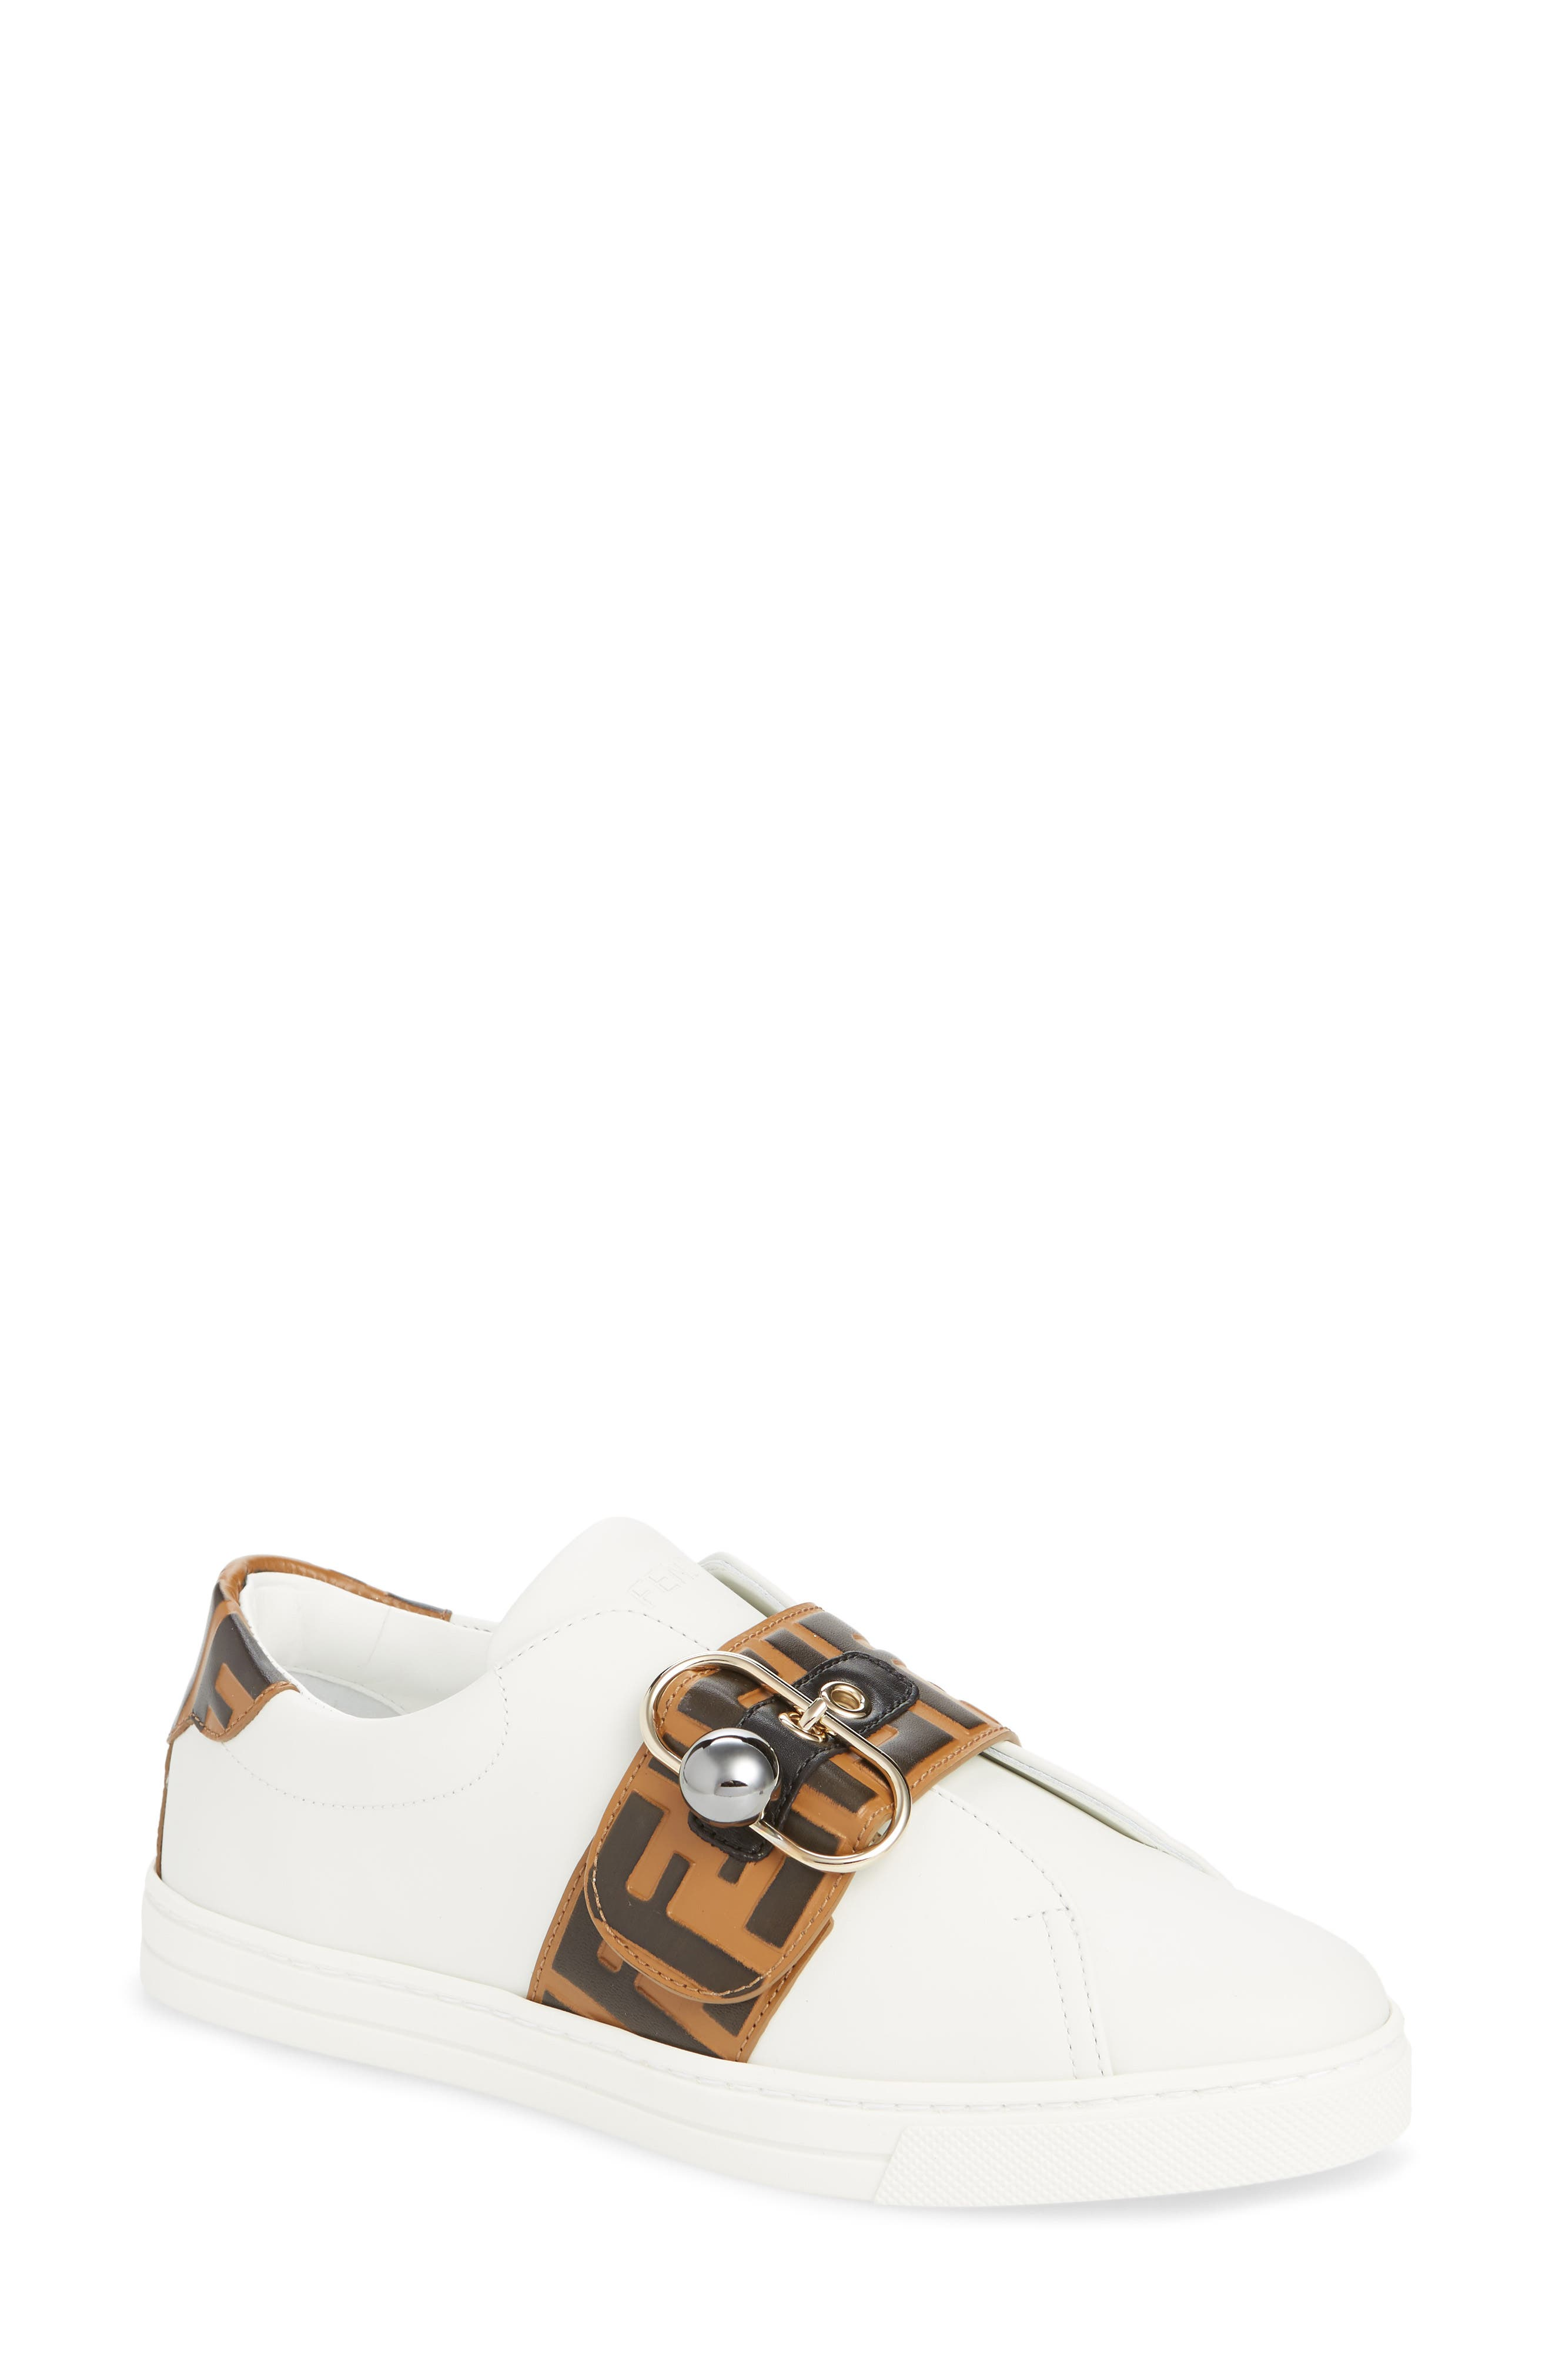 FENDI, Pearland Logo Slip-On Sneaker, Main thumbnail 1, color, WHITE/ BROWN